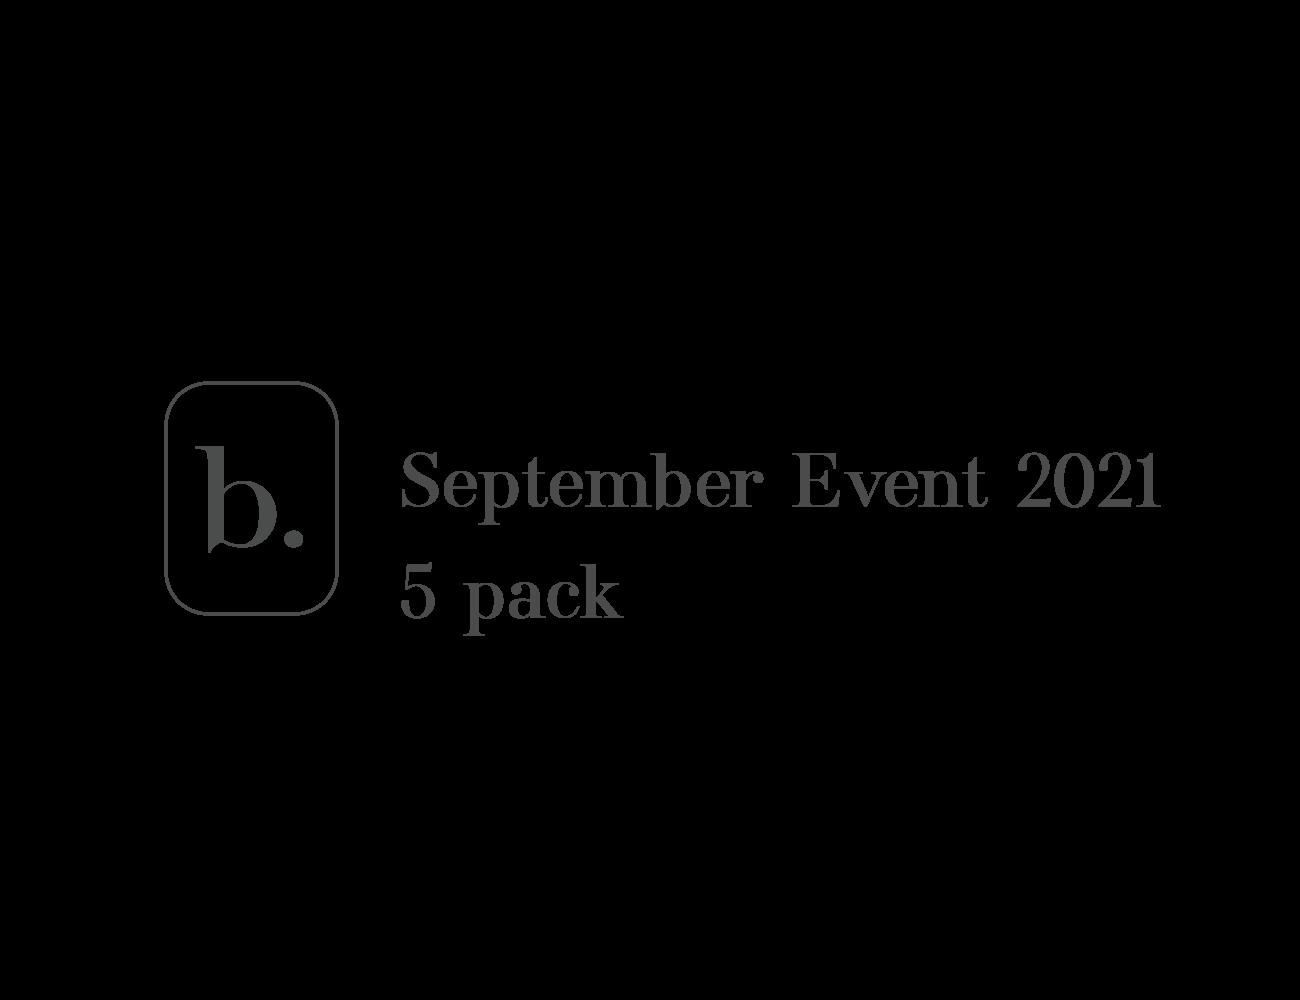 bio 2021 event - 5 pack